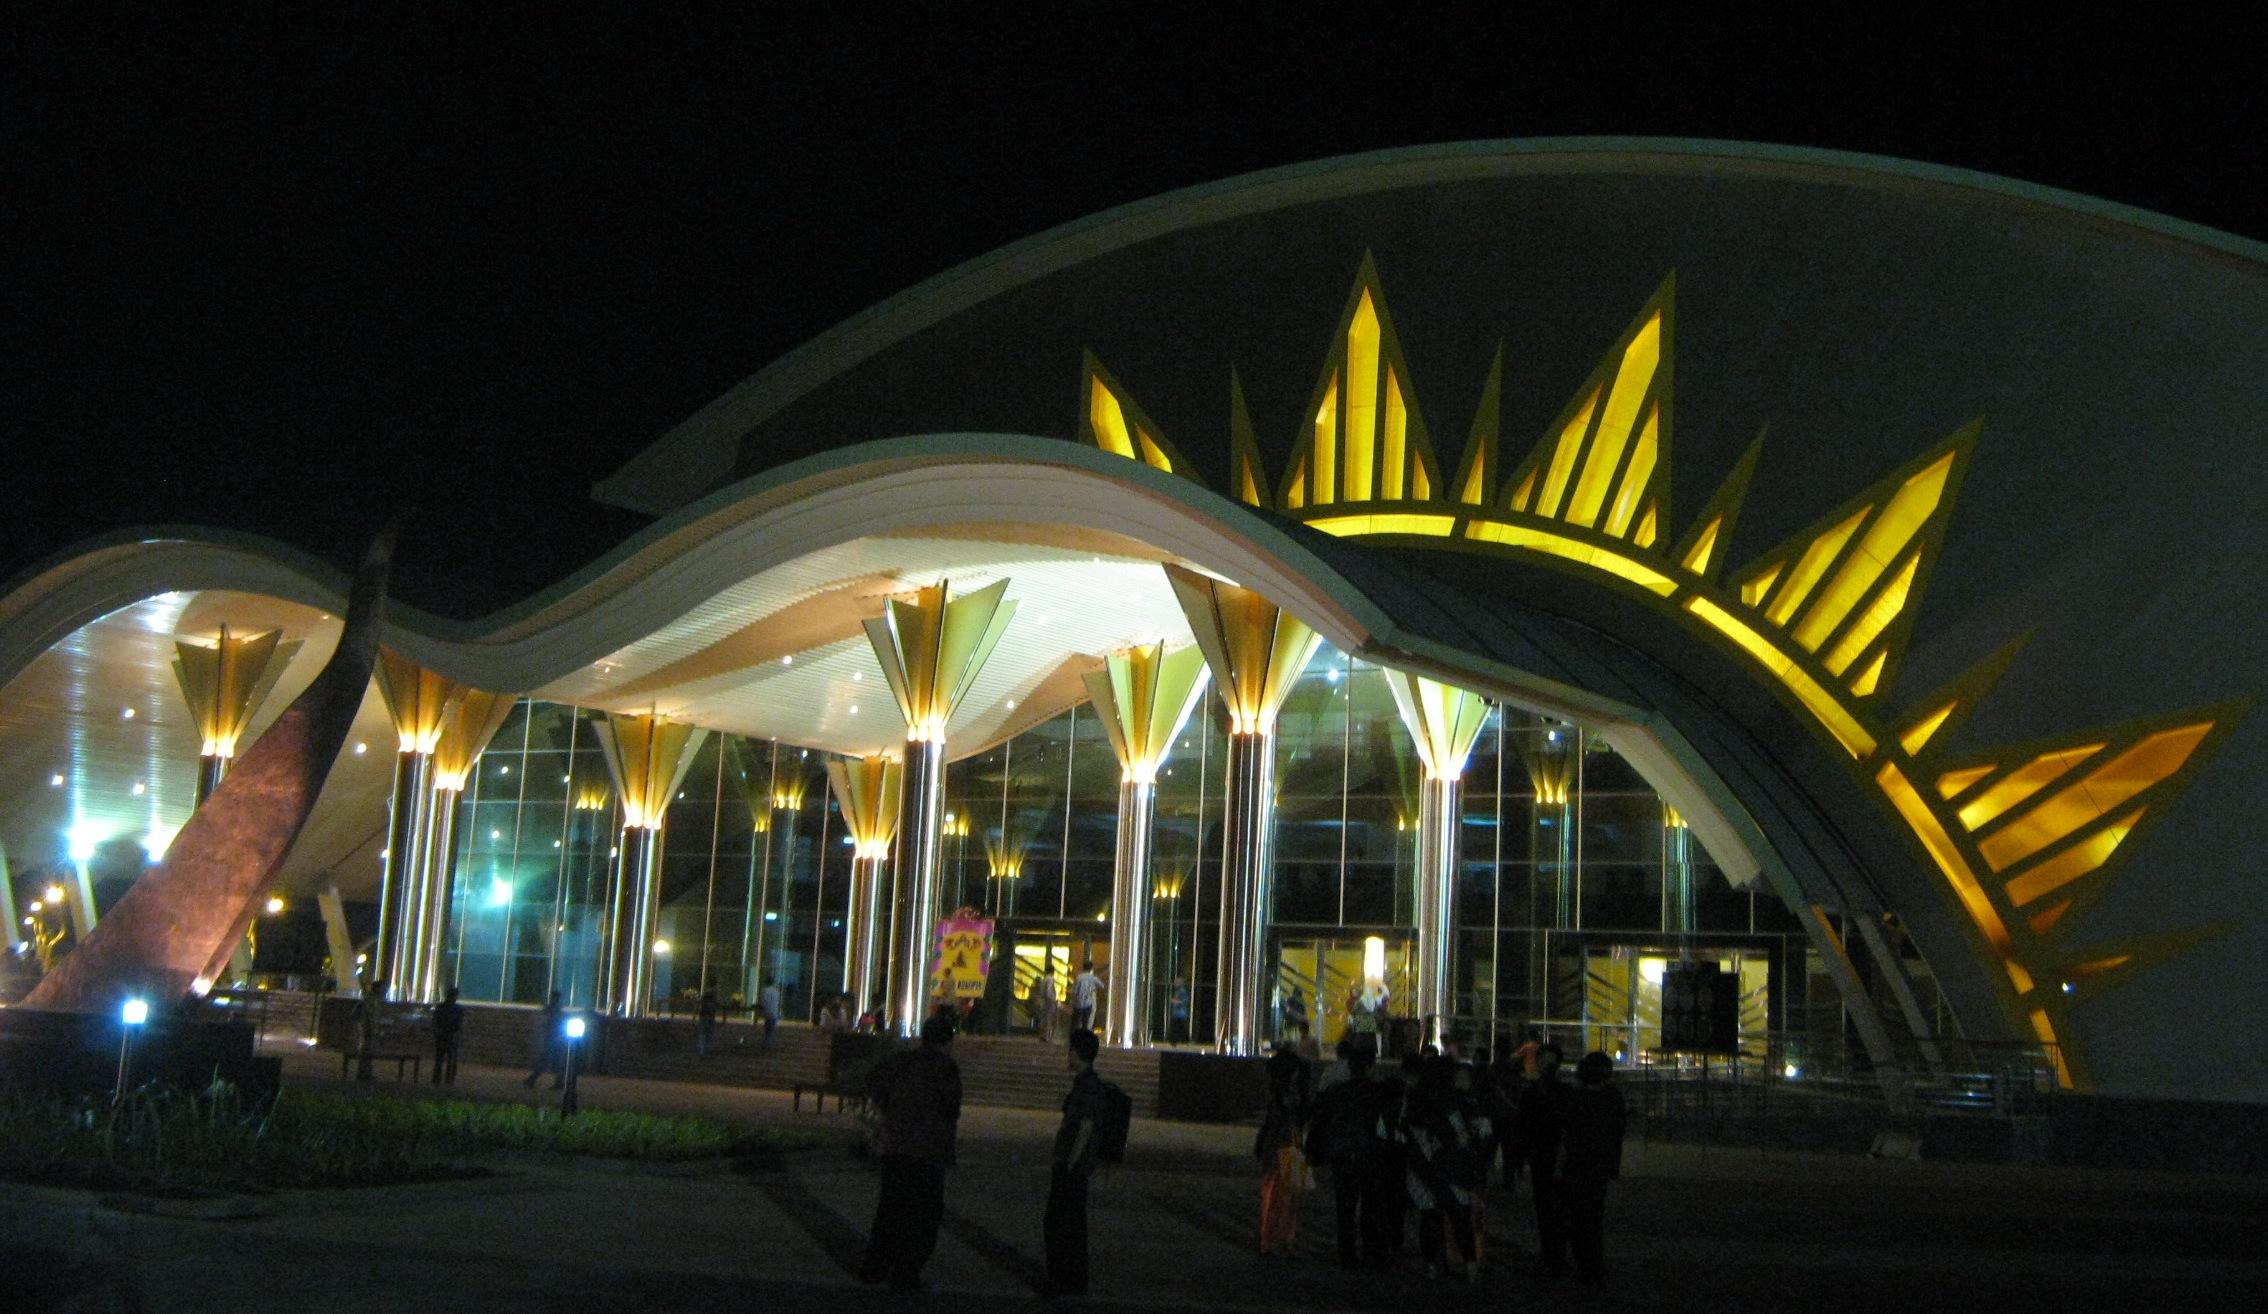 Jadwal Pendaftaran UMY Yogyakarta 2019/2020